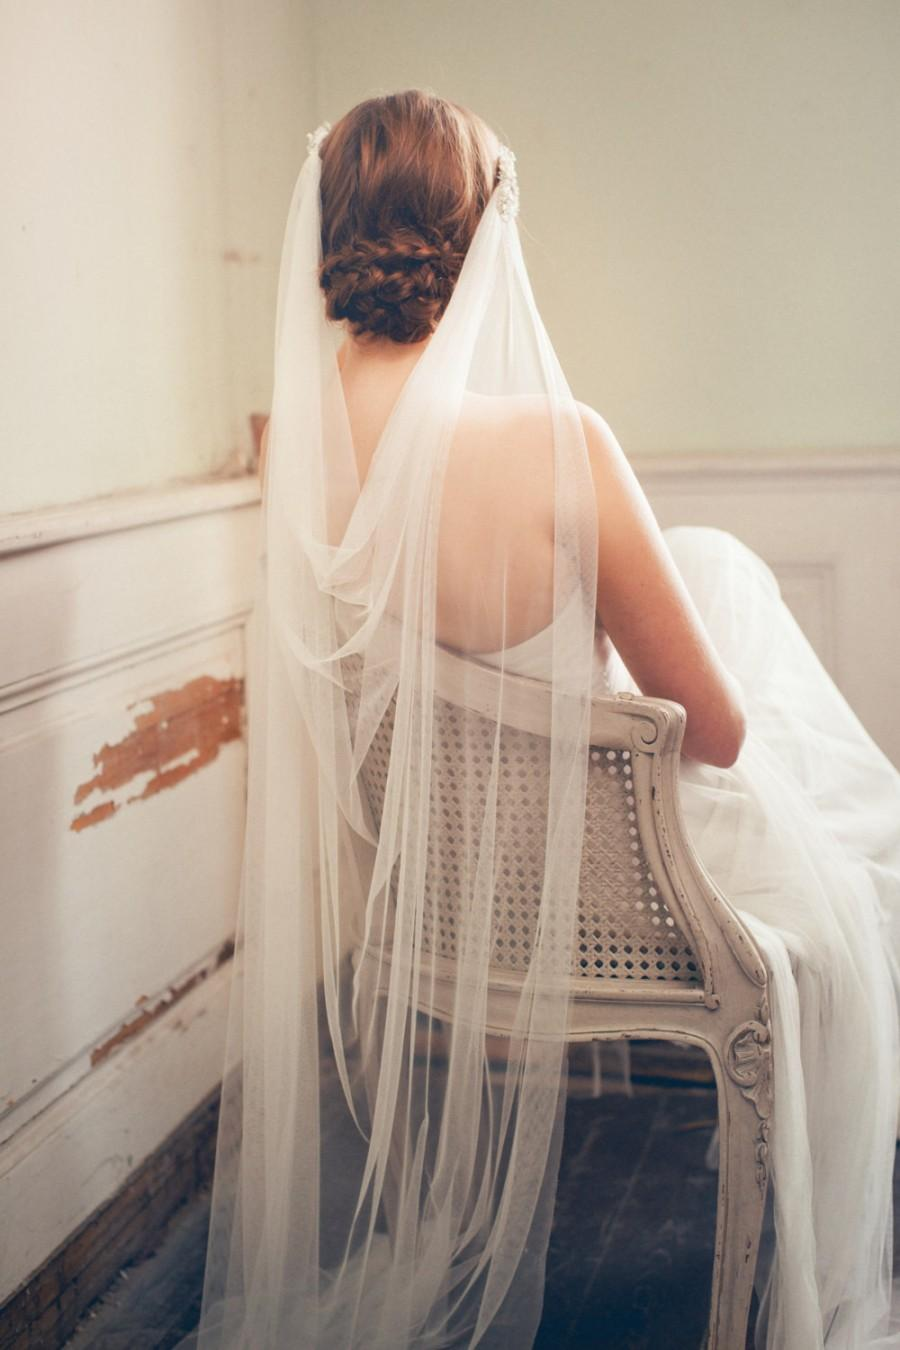 Mariage - Wedding Headpiece - Bridal Veil - Boho Ivory Veil - Floor Length Wedding Veil - Bohemian Wedding - Beach Wedding Veil - VIOLA